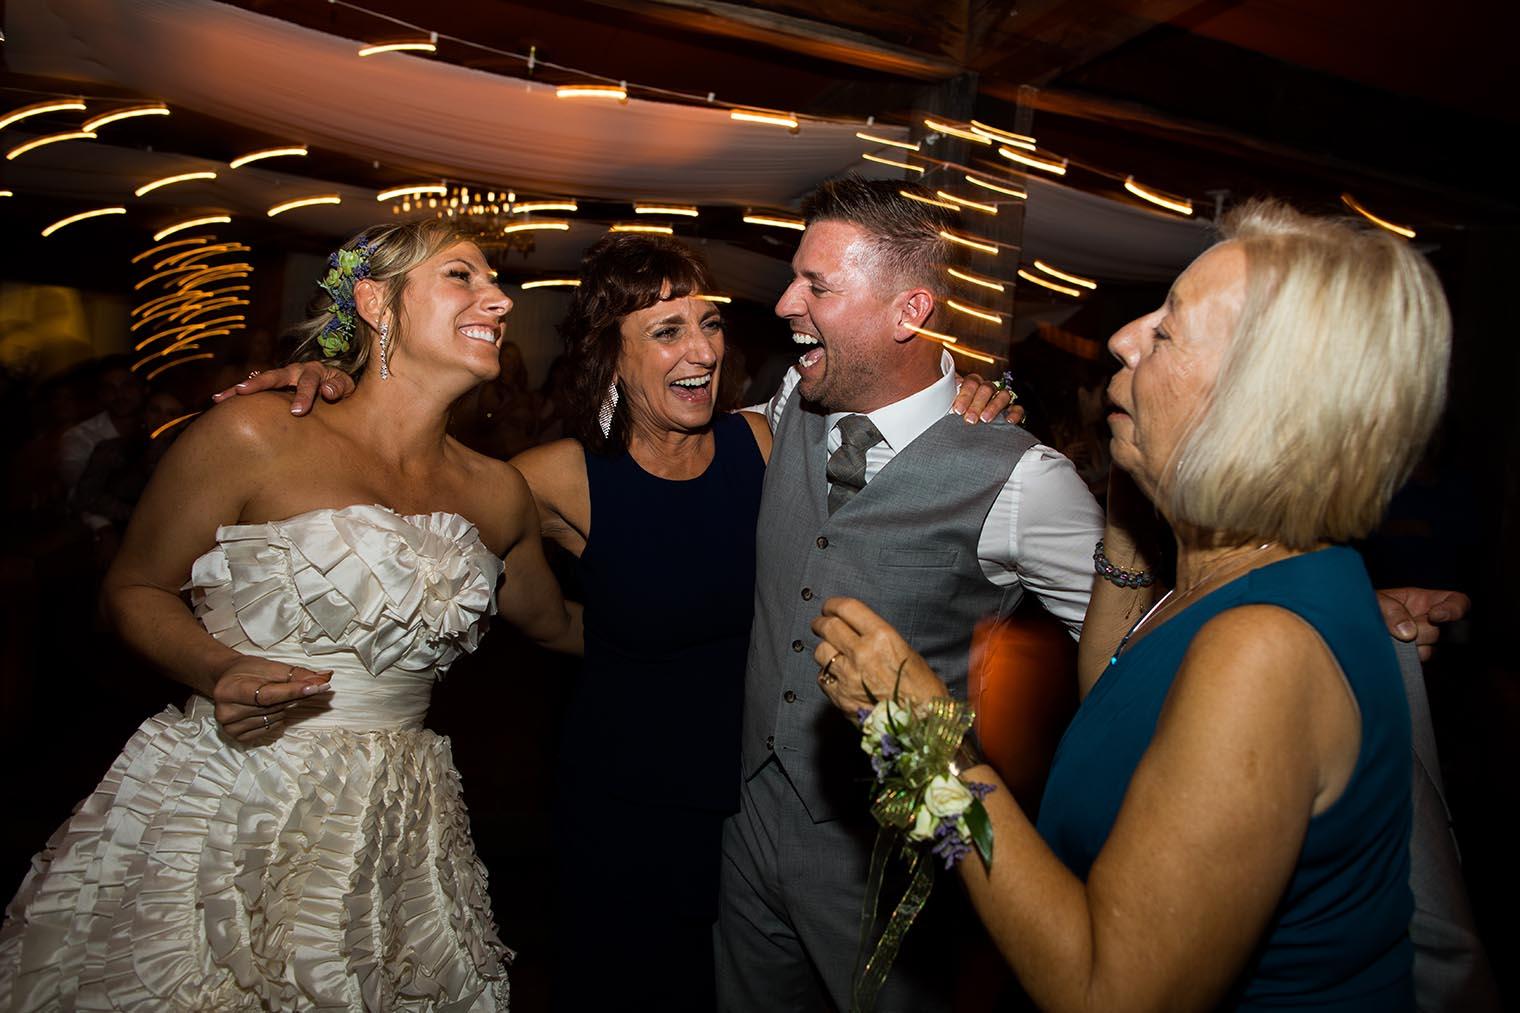 wedding reception at heritage house resort